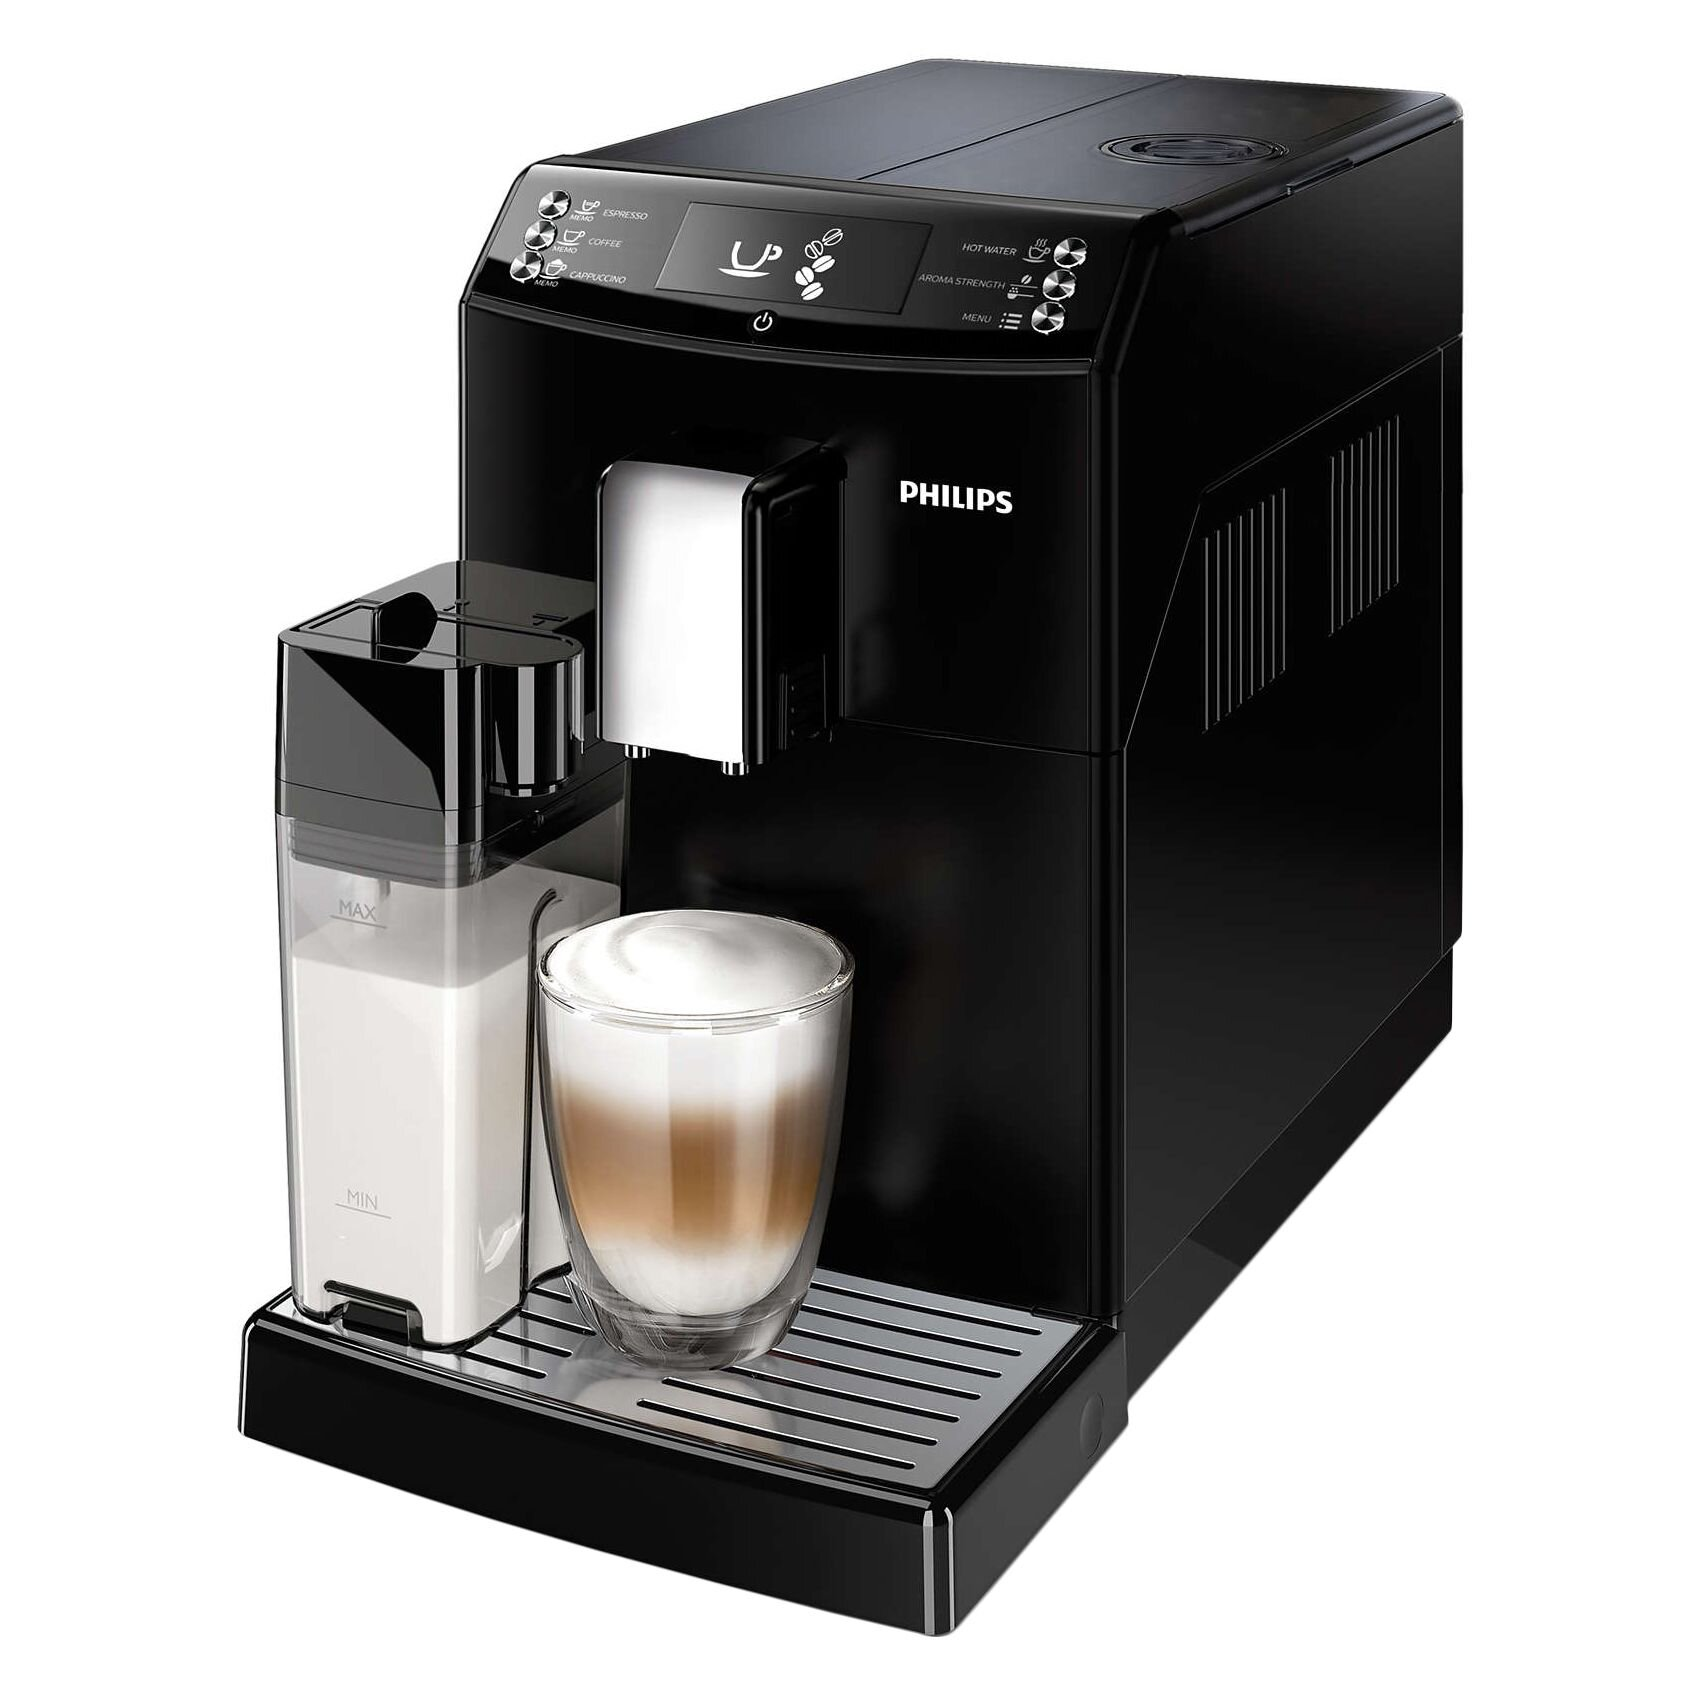 Espressor super automat Philips Seria 3100, EP3550/00, 1.8l, negru